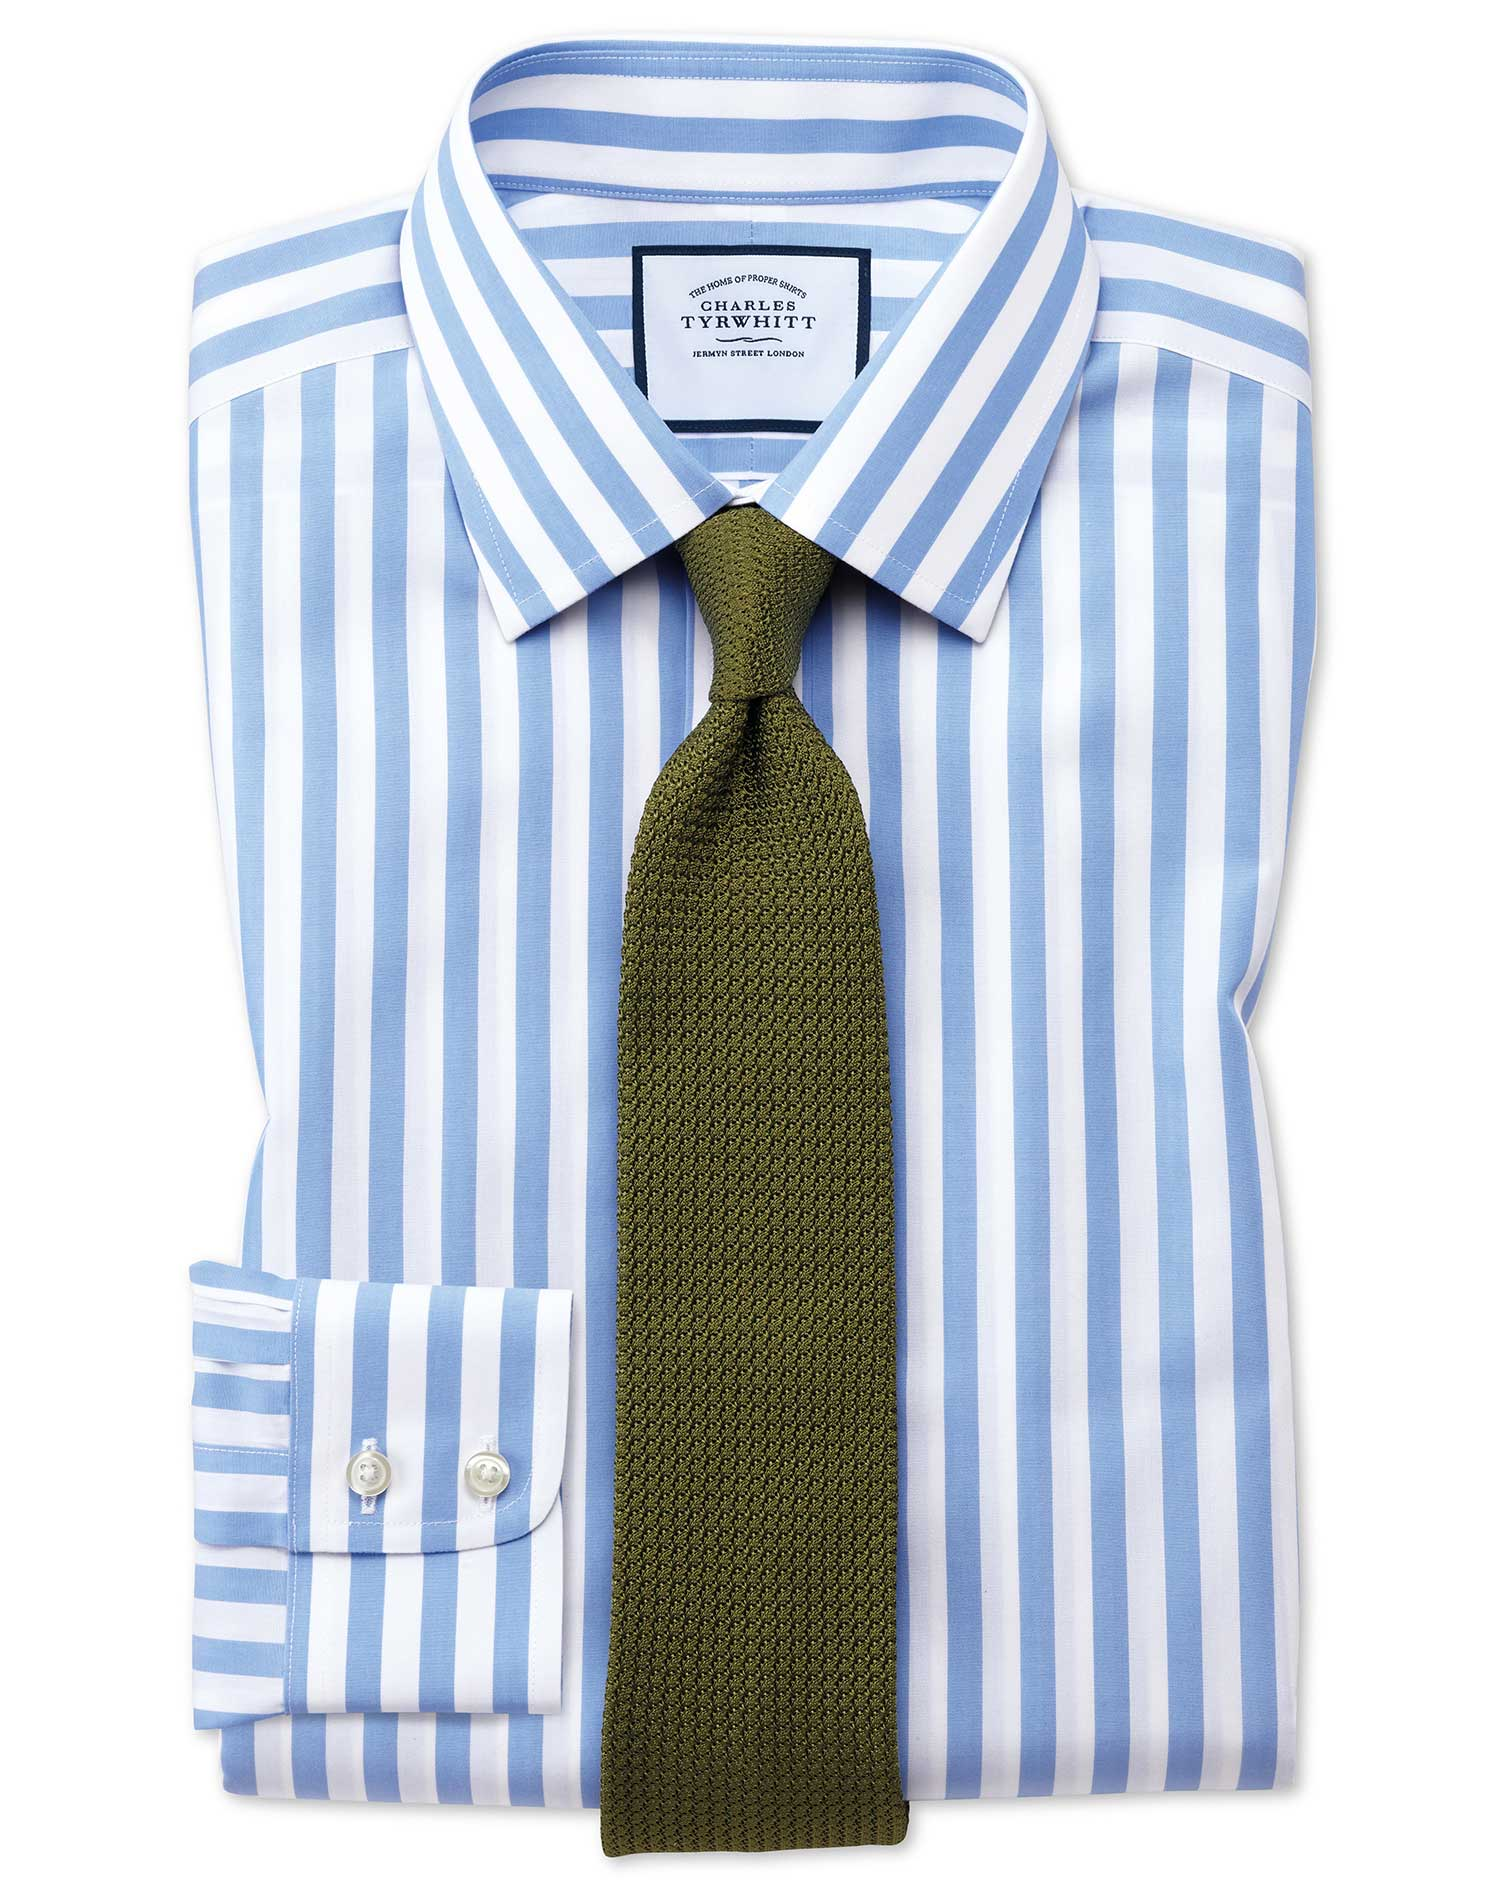 Slim Fit Non-Iron Jermyn Street Stripes Sky Cotton Formal Shirt Single Cuff Size 15.5/34 by Charles